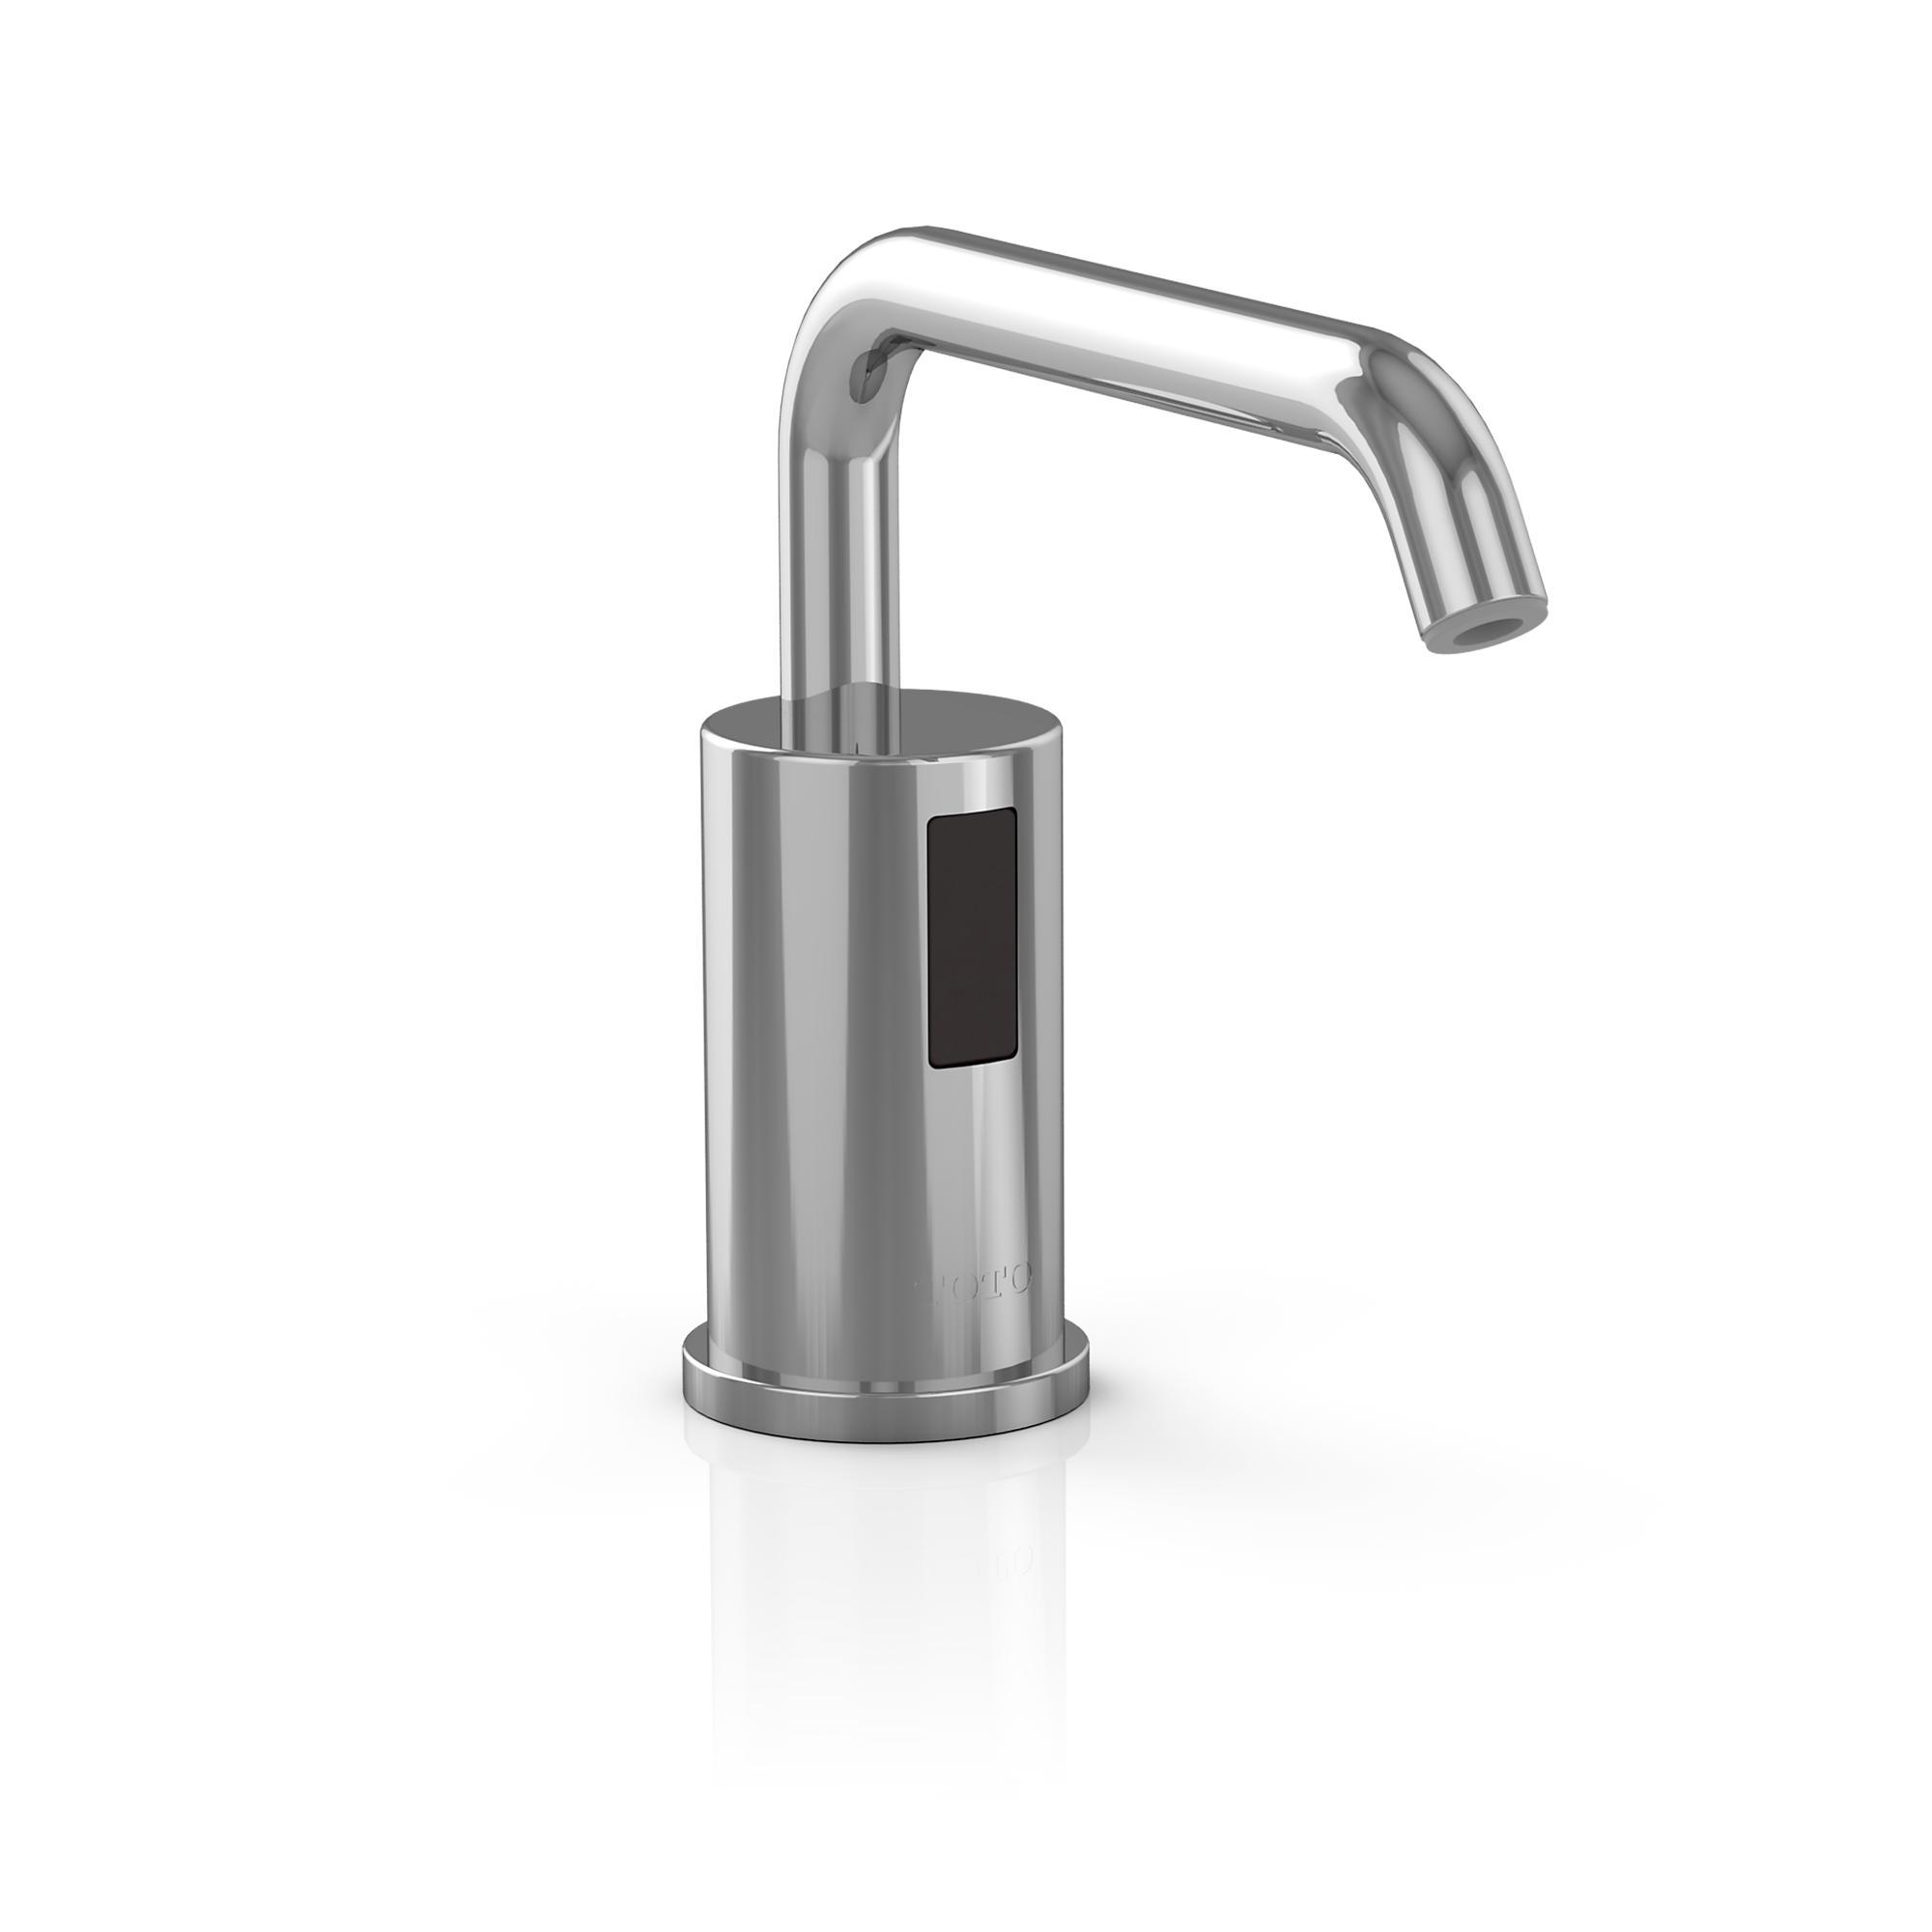 Tes100aa cp toto sensor operated soap dispenser   ac 0